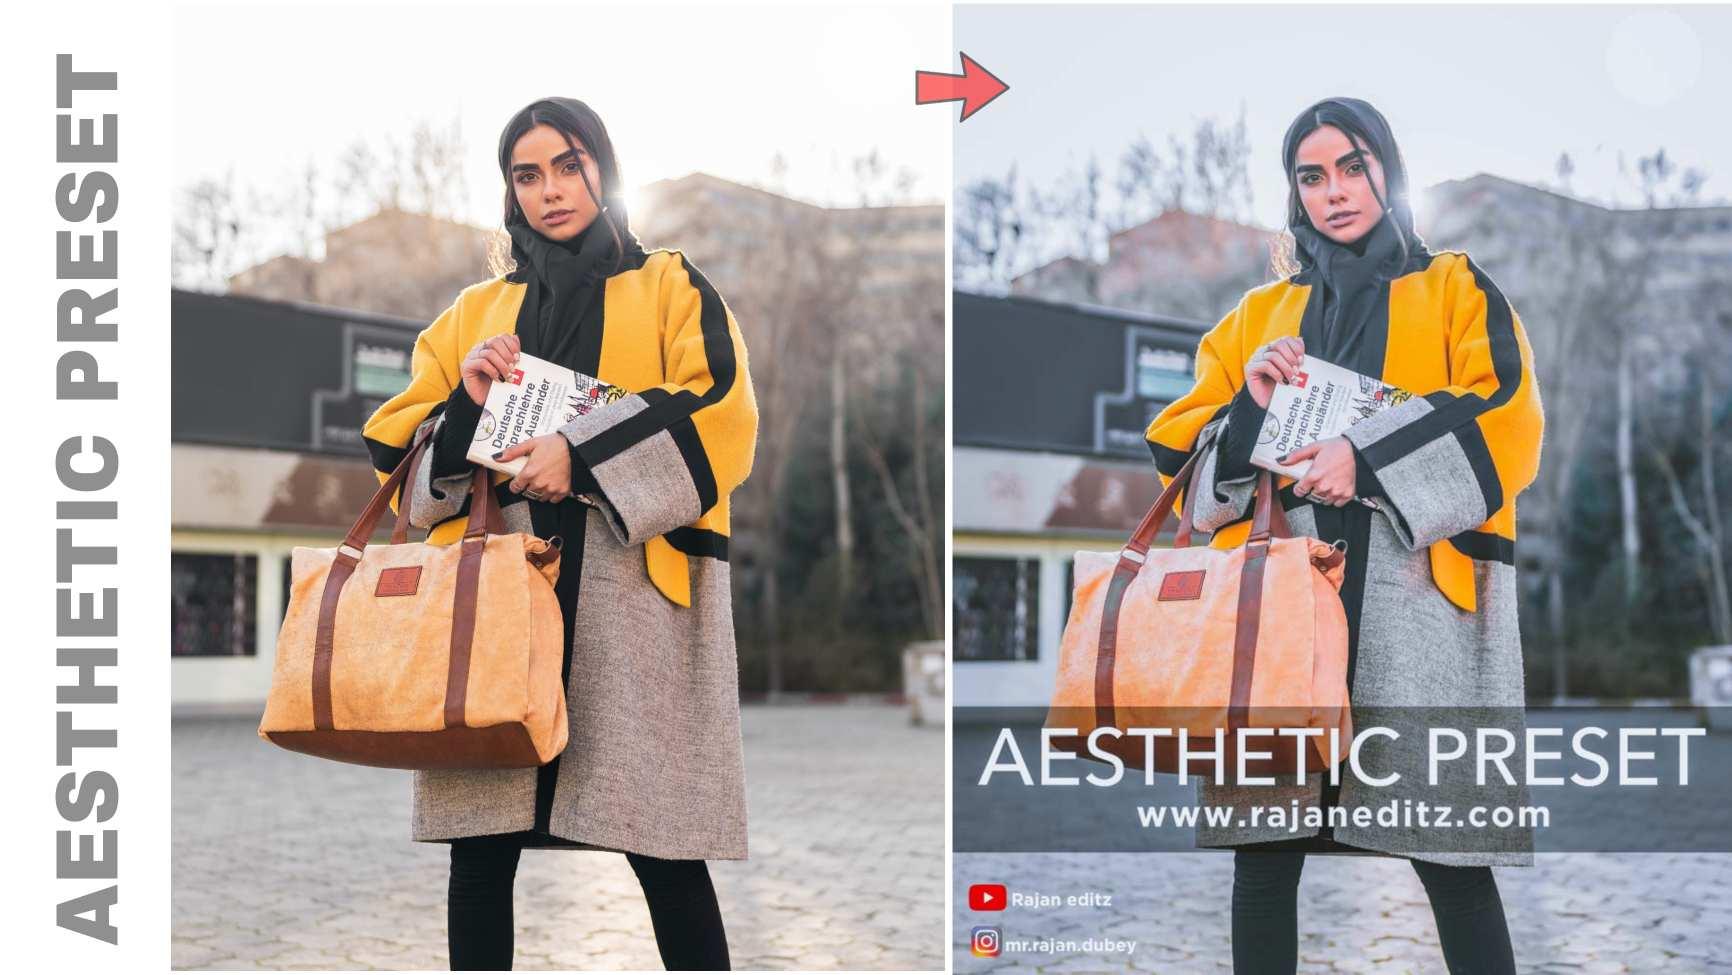 Aesthetic preset free lightroom preset